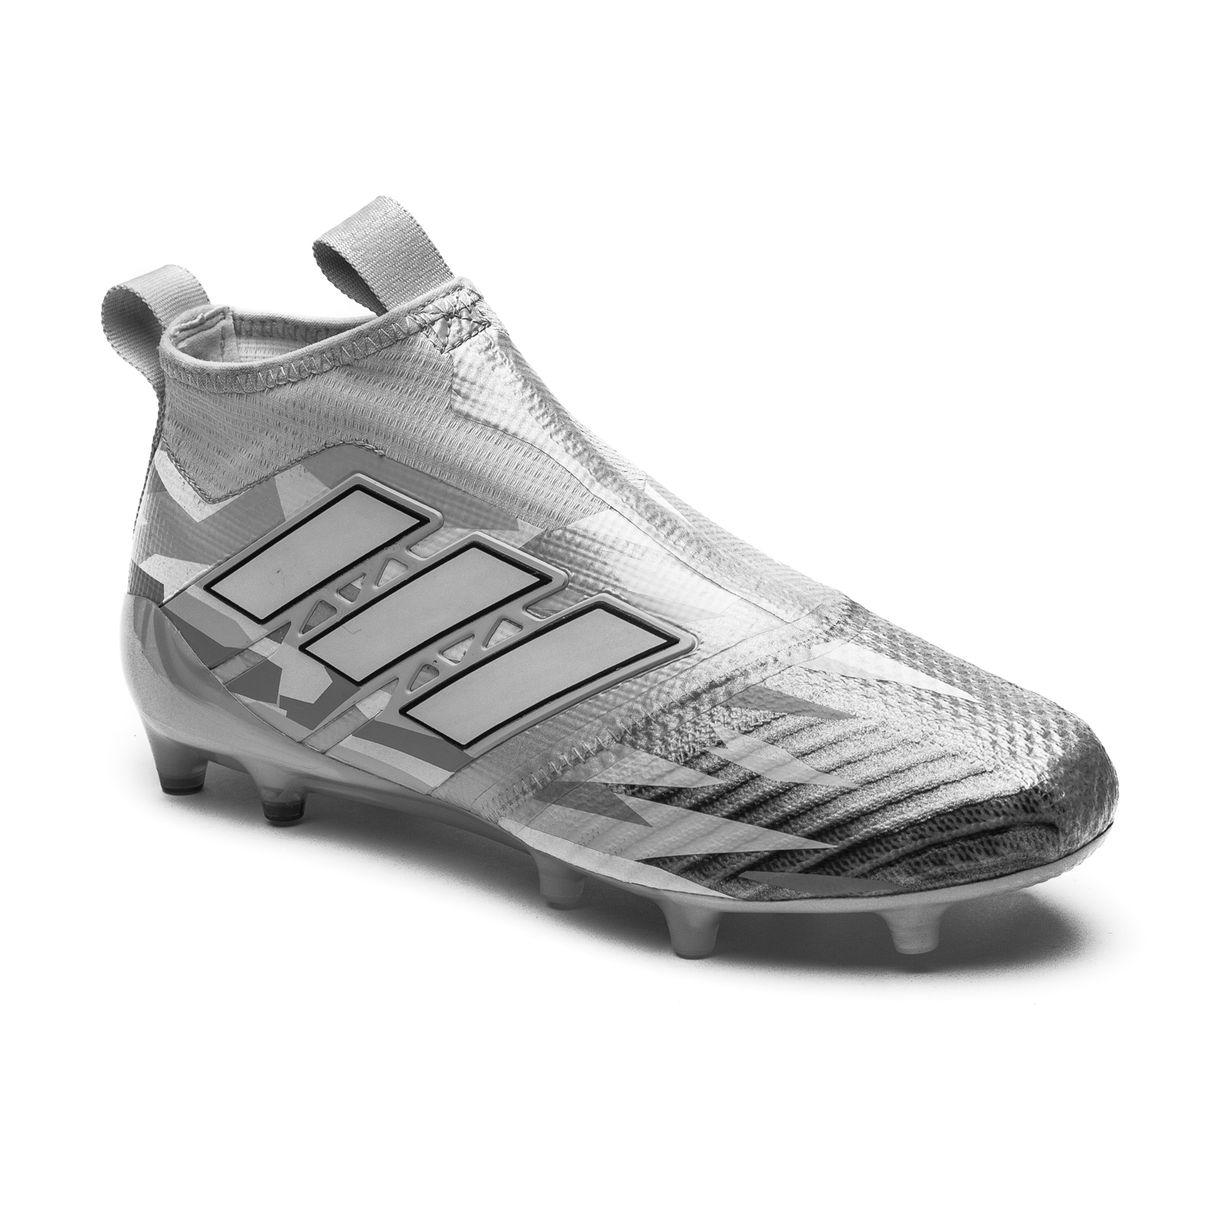 official photos ea2dd 167ff Adidas ACE 17+ Purecontrol Camo Pack